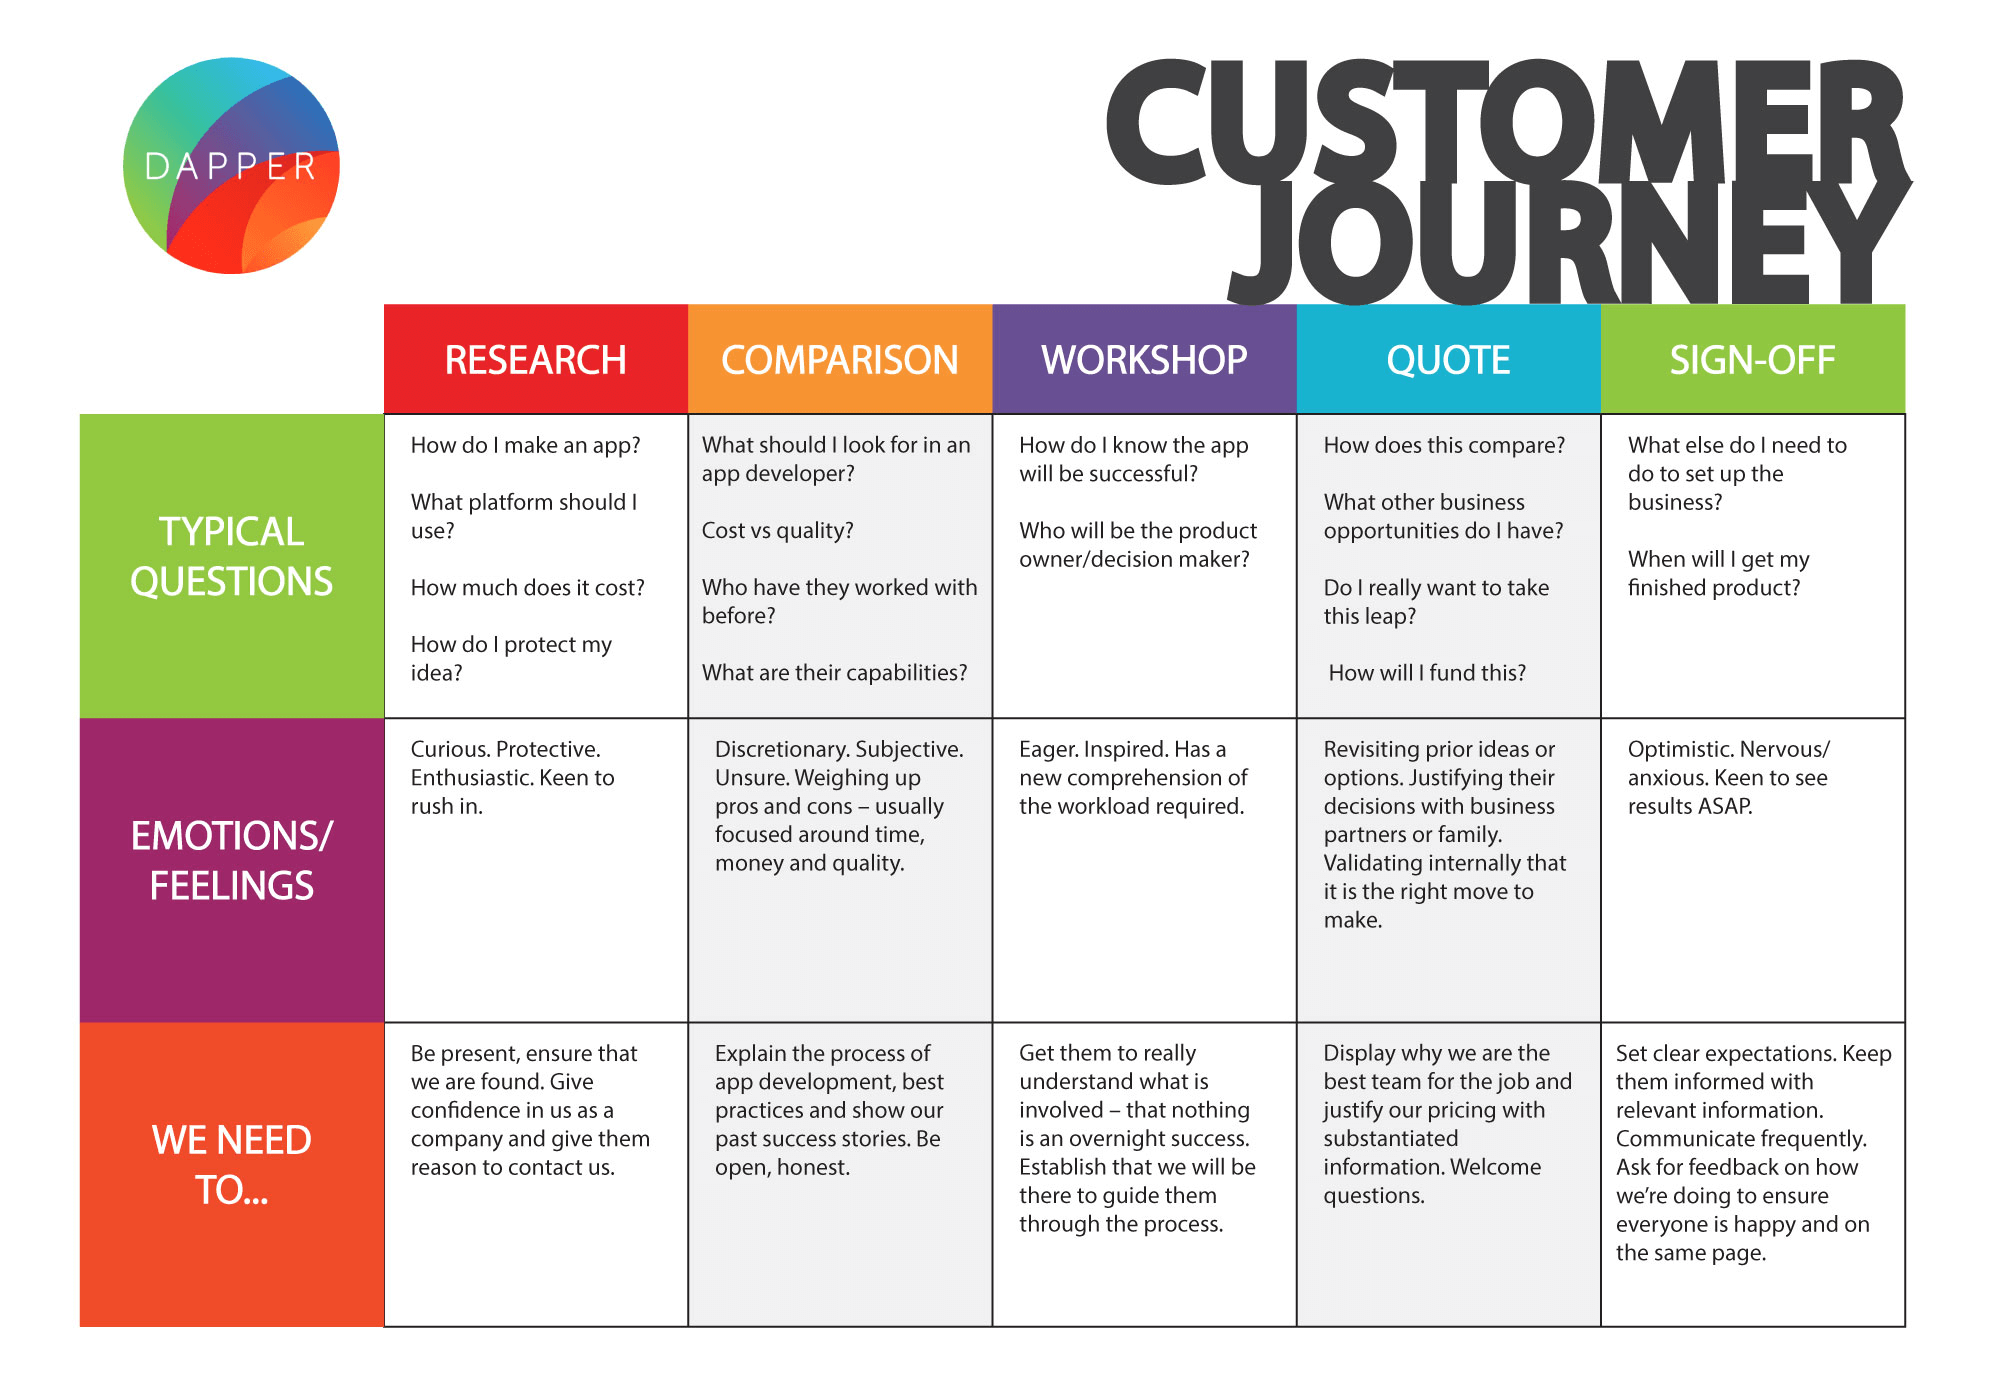 Dapper Customer Journey Map | Customer Experience & UX | Customer